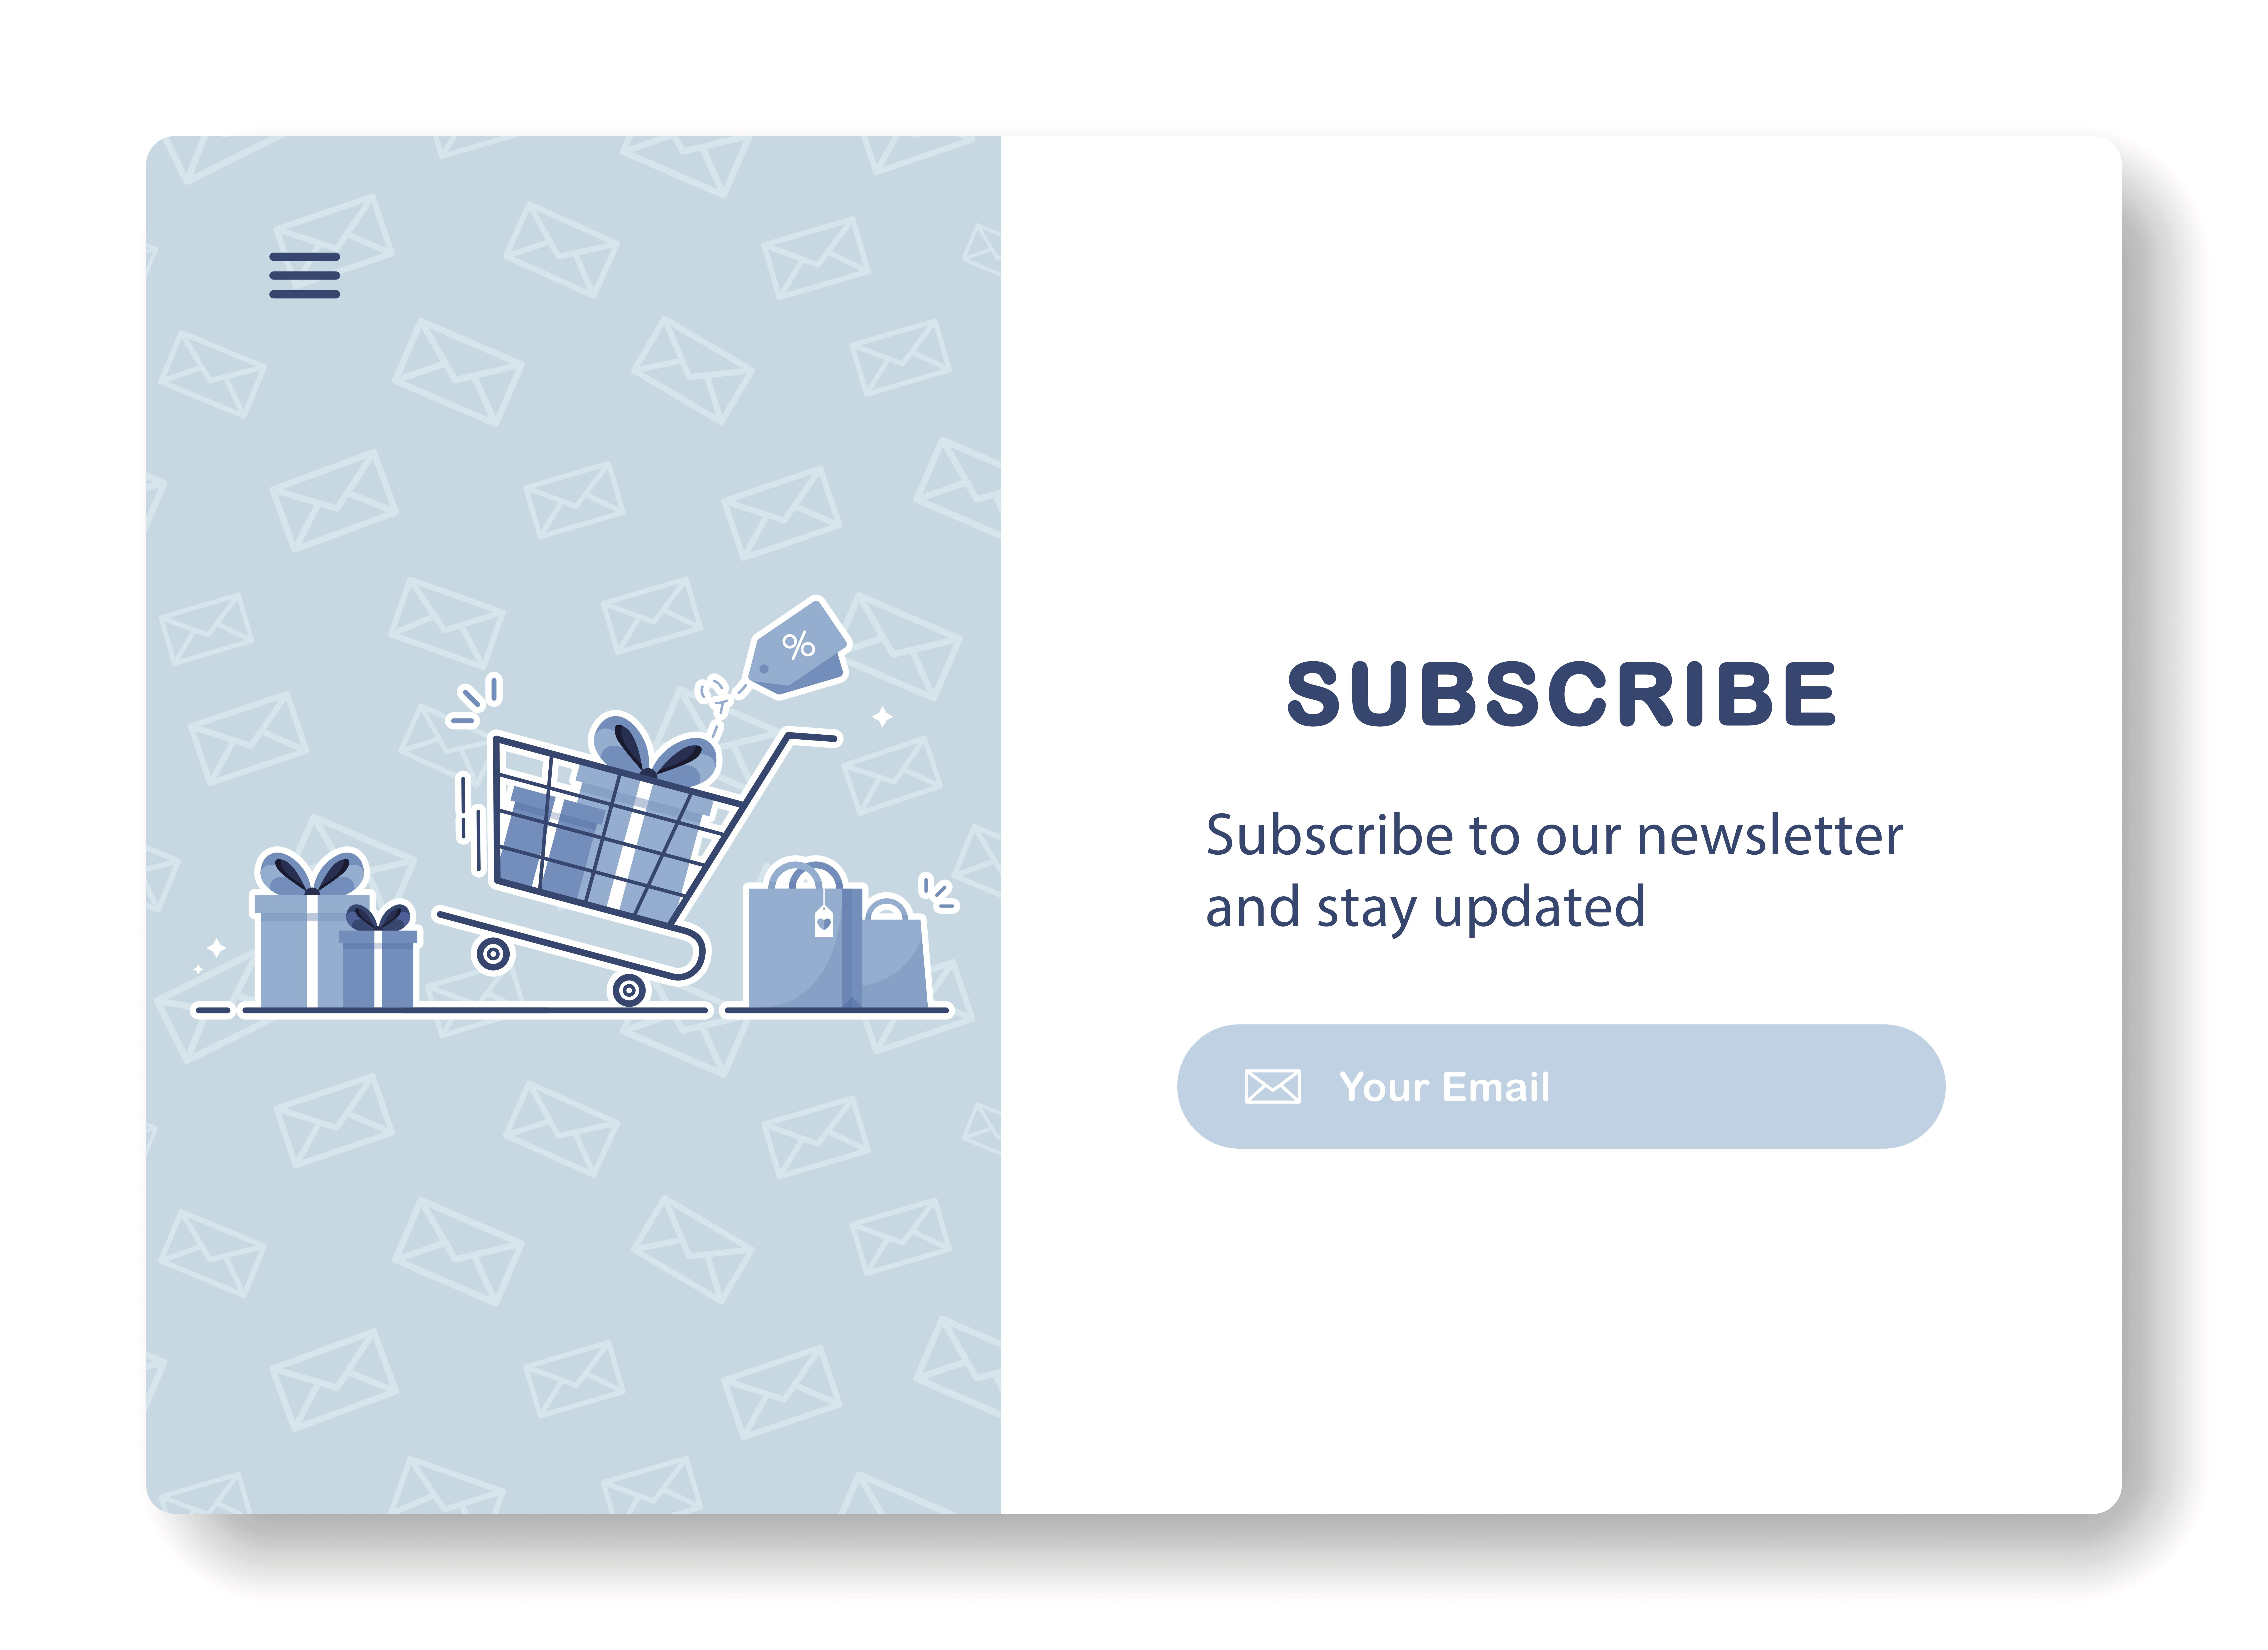 Newsletterpopup